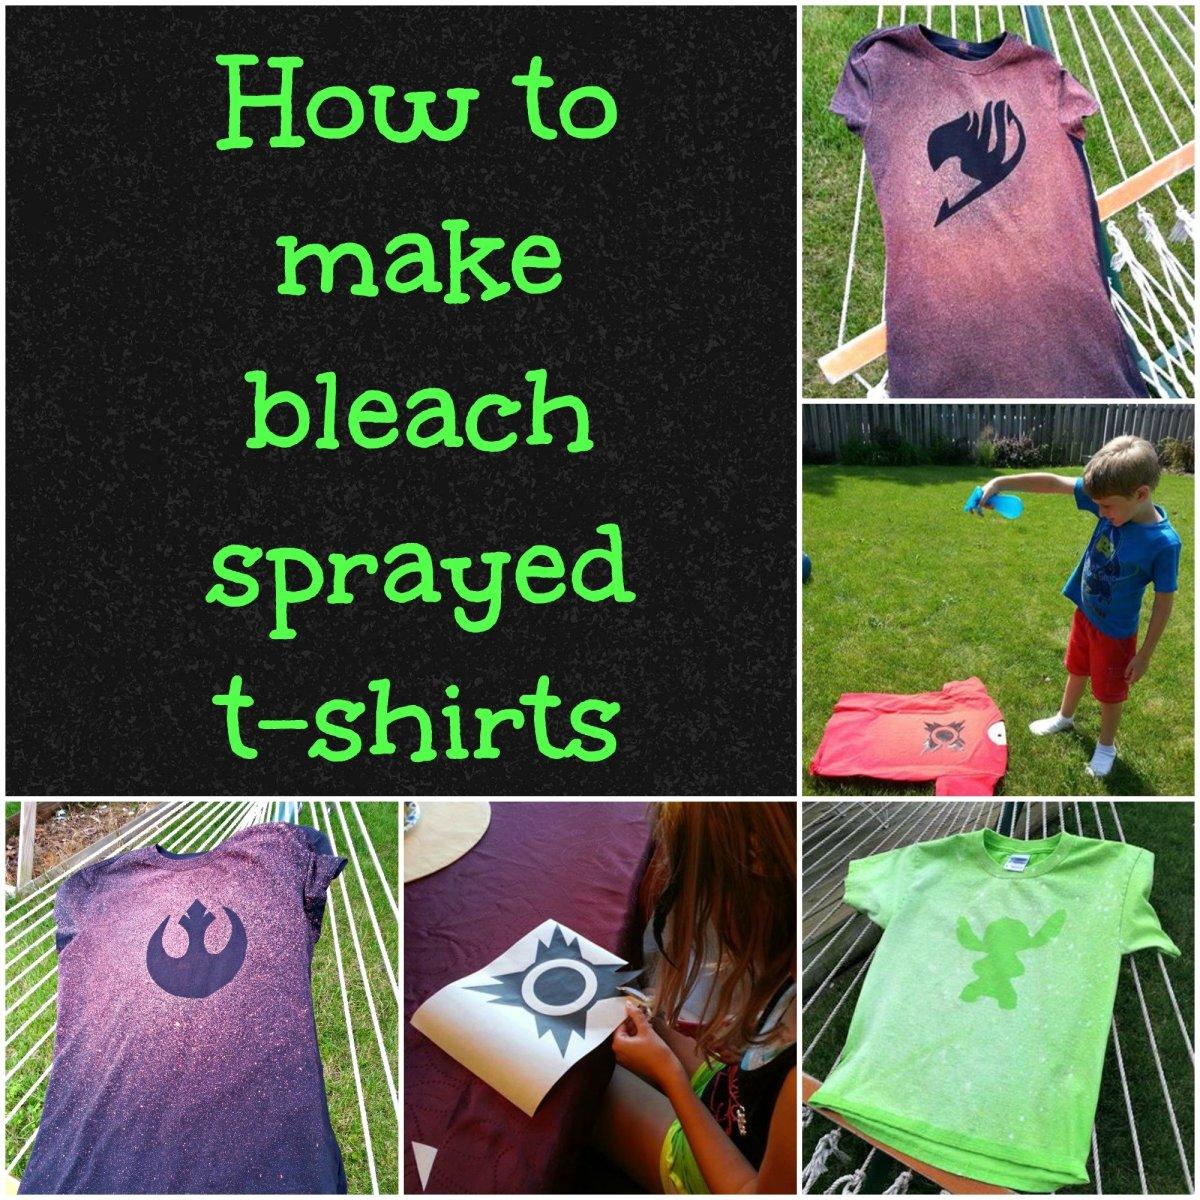 How to Make Bleach Spray T-Shirts